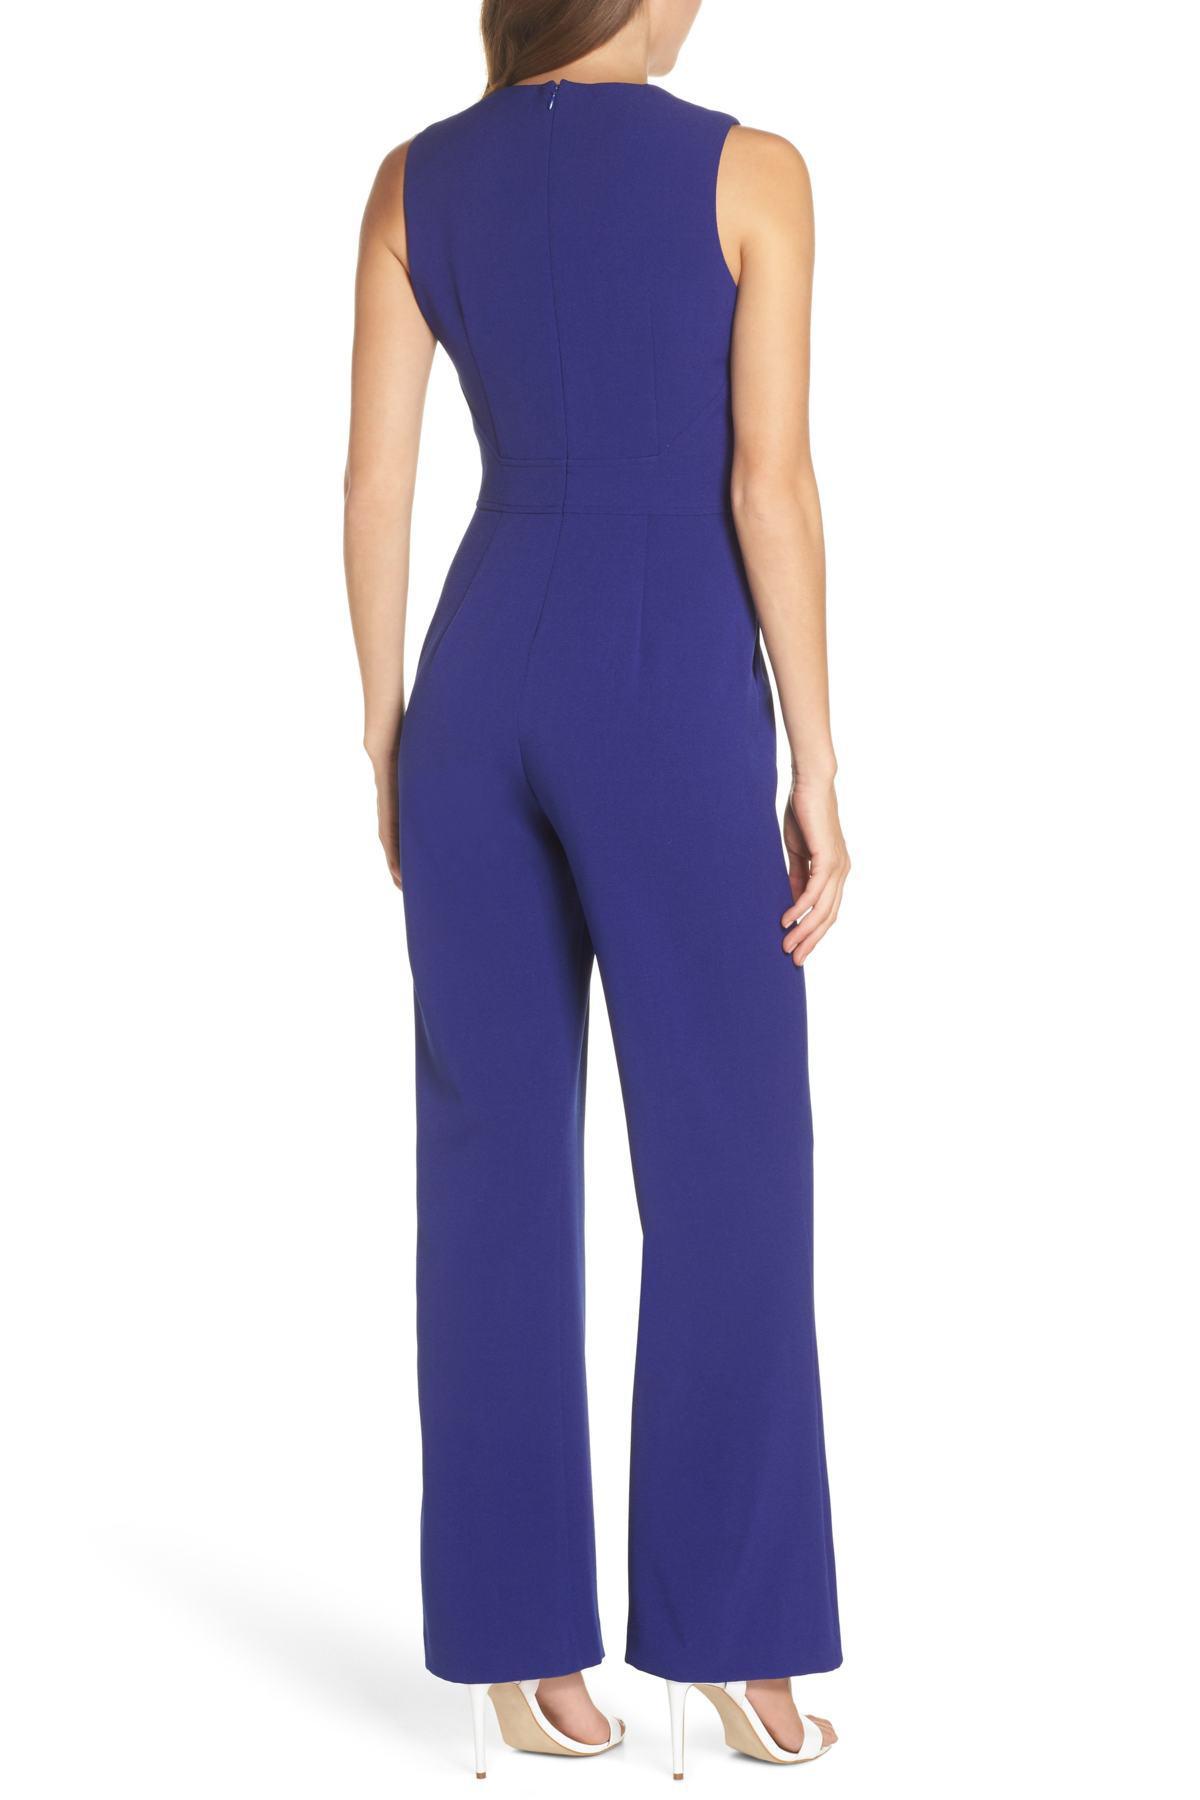 dd28b374f01 Vince Camuto - Blue Tie Waist Crepe Jumpsuit (regular   Petite) - Lyst.  View fullscreen